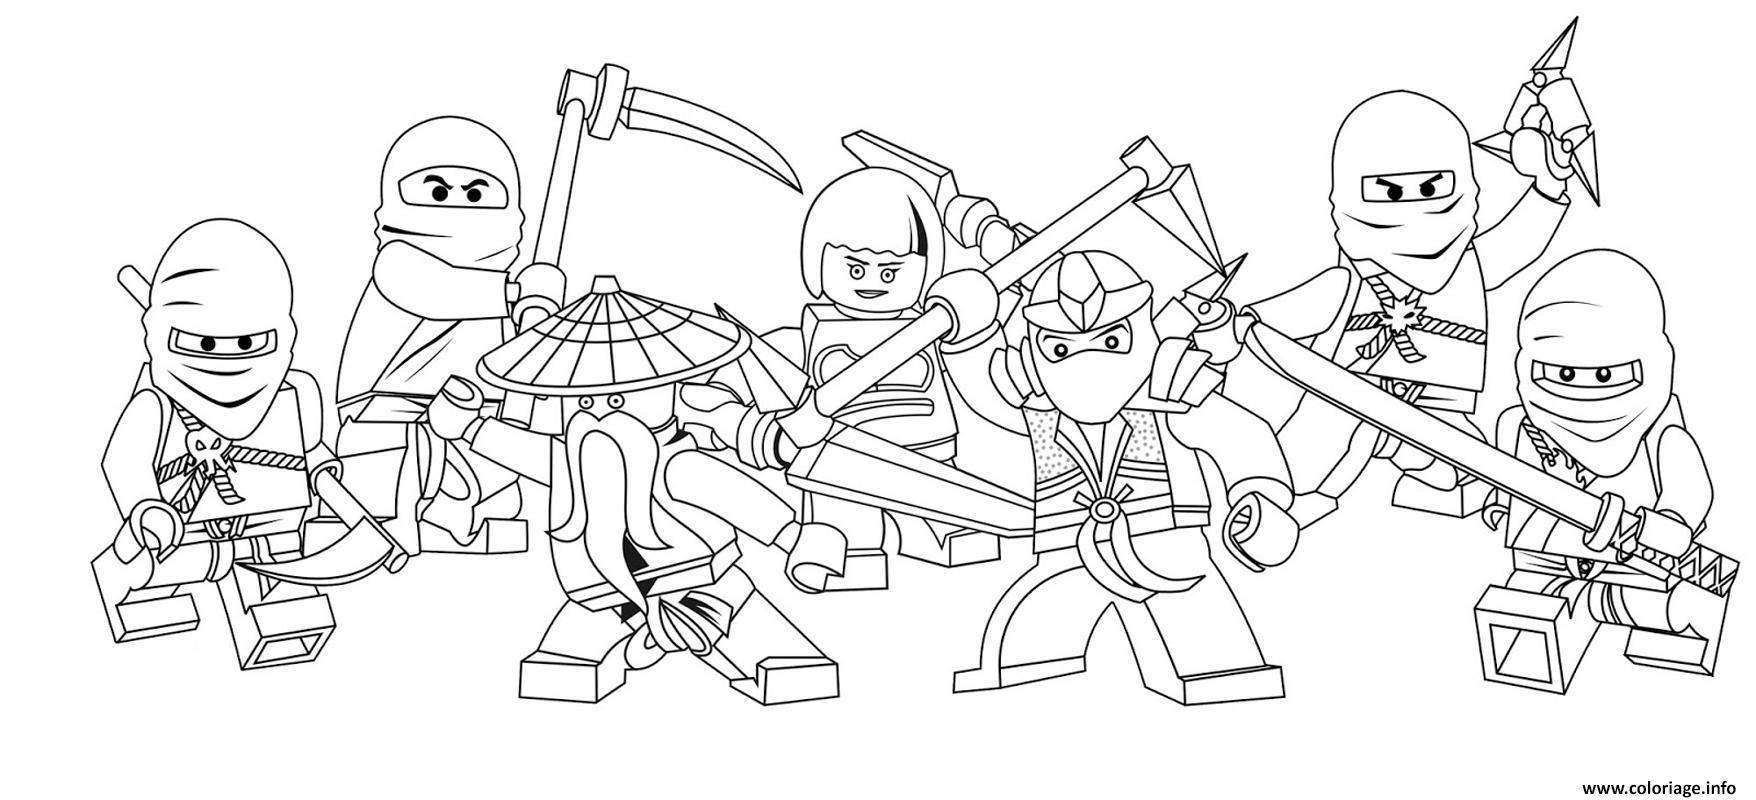 Coloriage Lego Marvel Vs Ninjago Lego Dessin